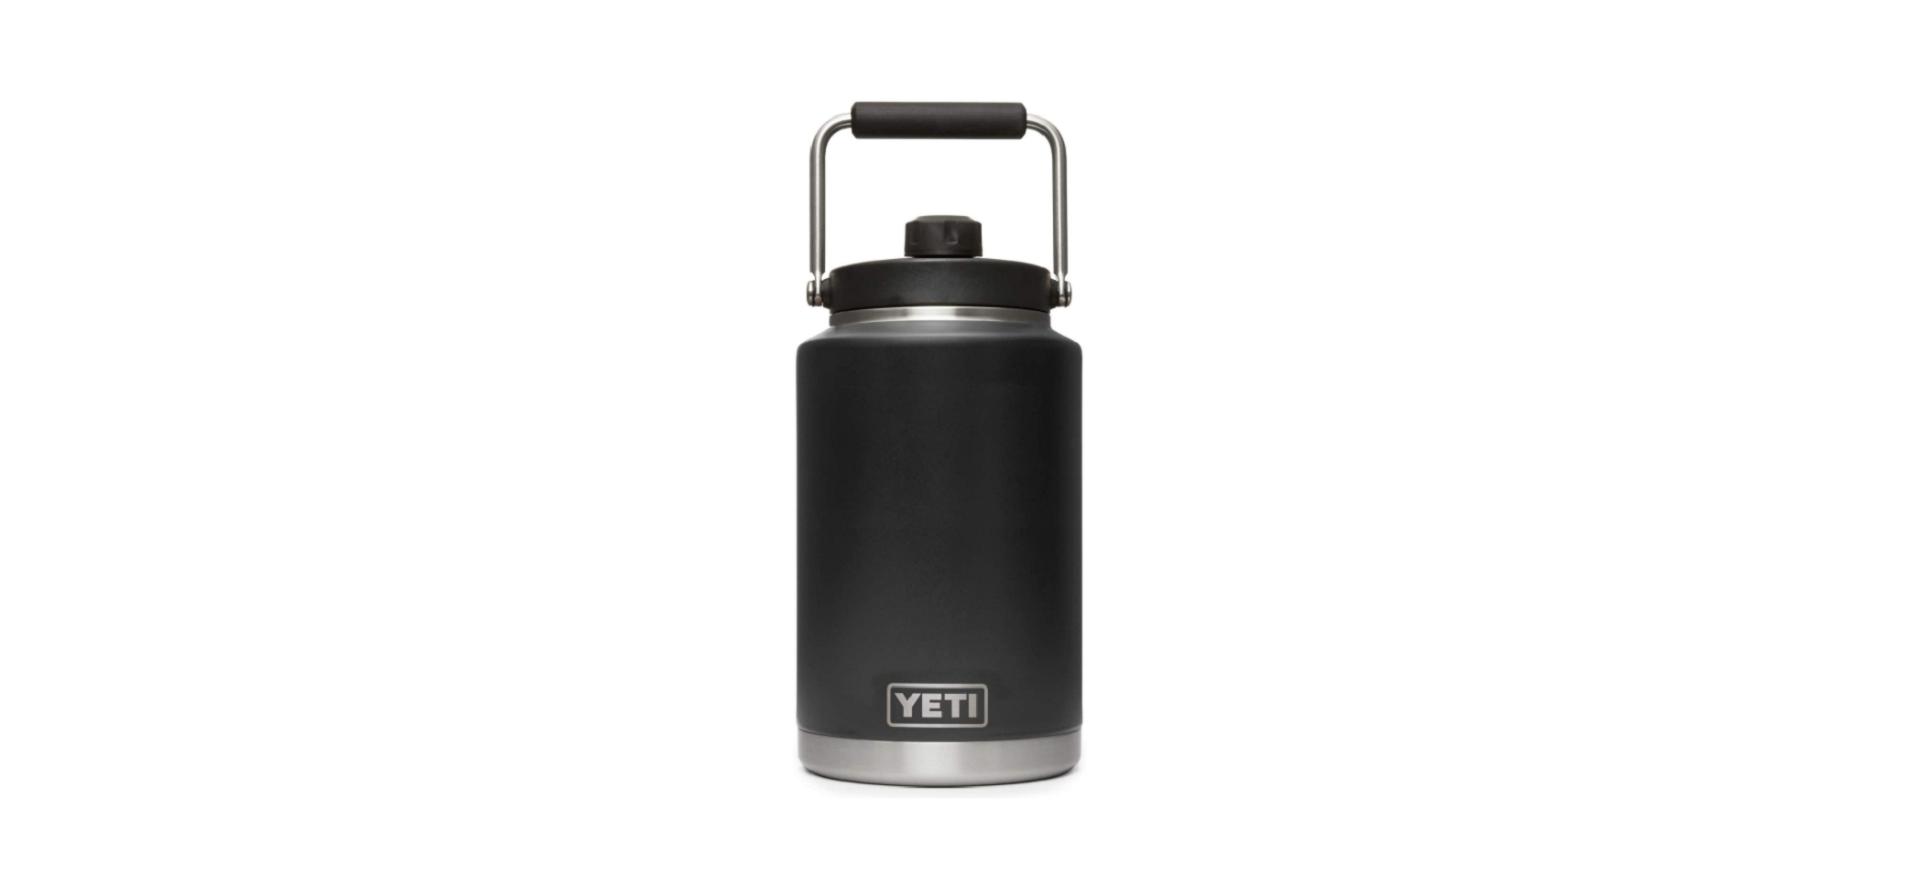 Yeti best stainless steel waterbottles